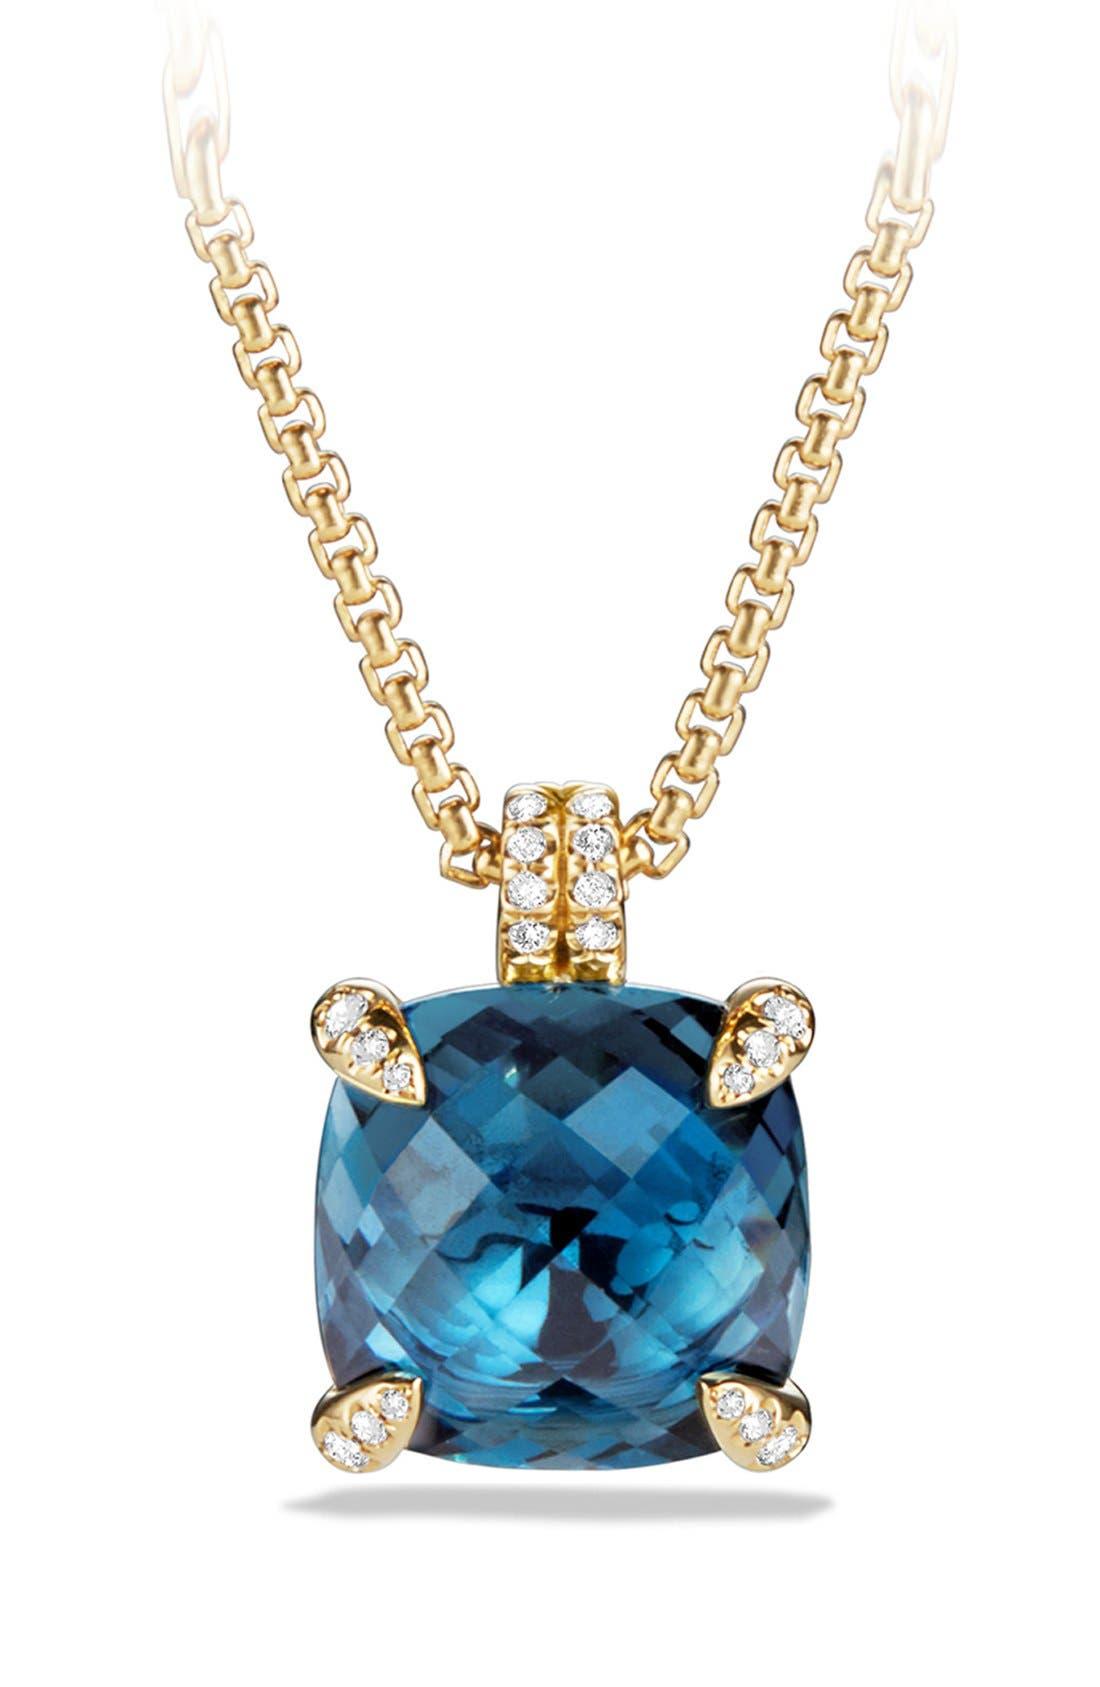 David Yurman 'Châtelaine' Pendant Necklace with Diamonds in 18K Gold